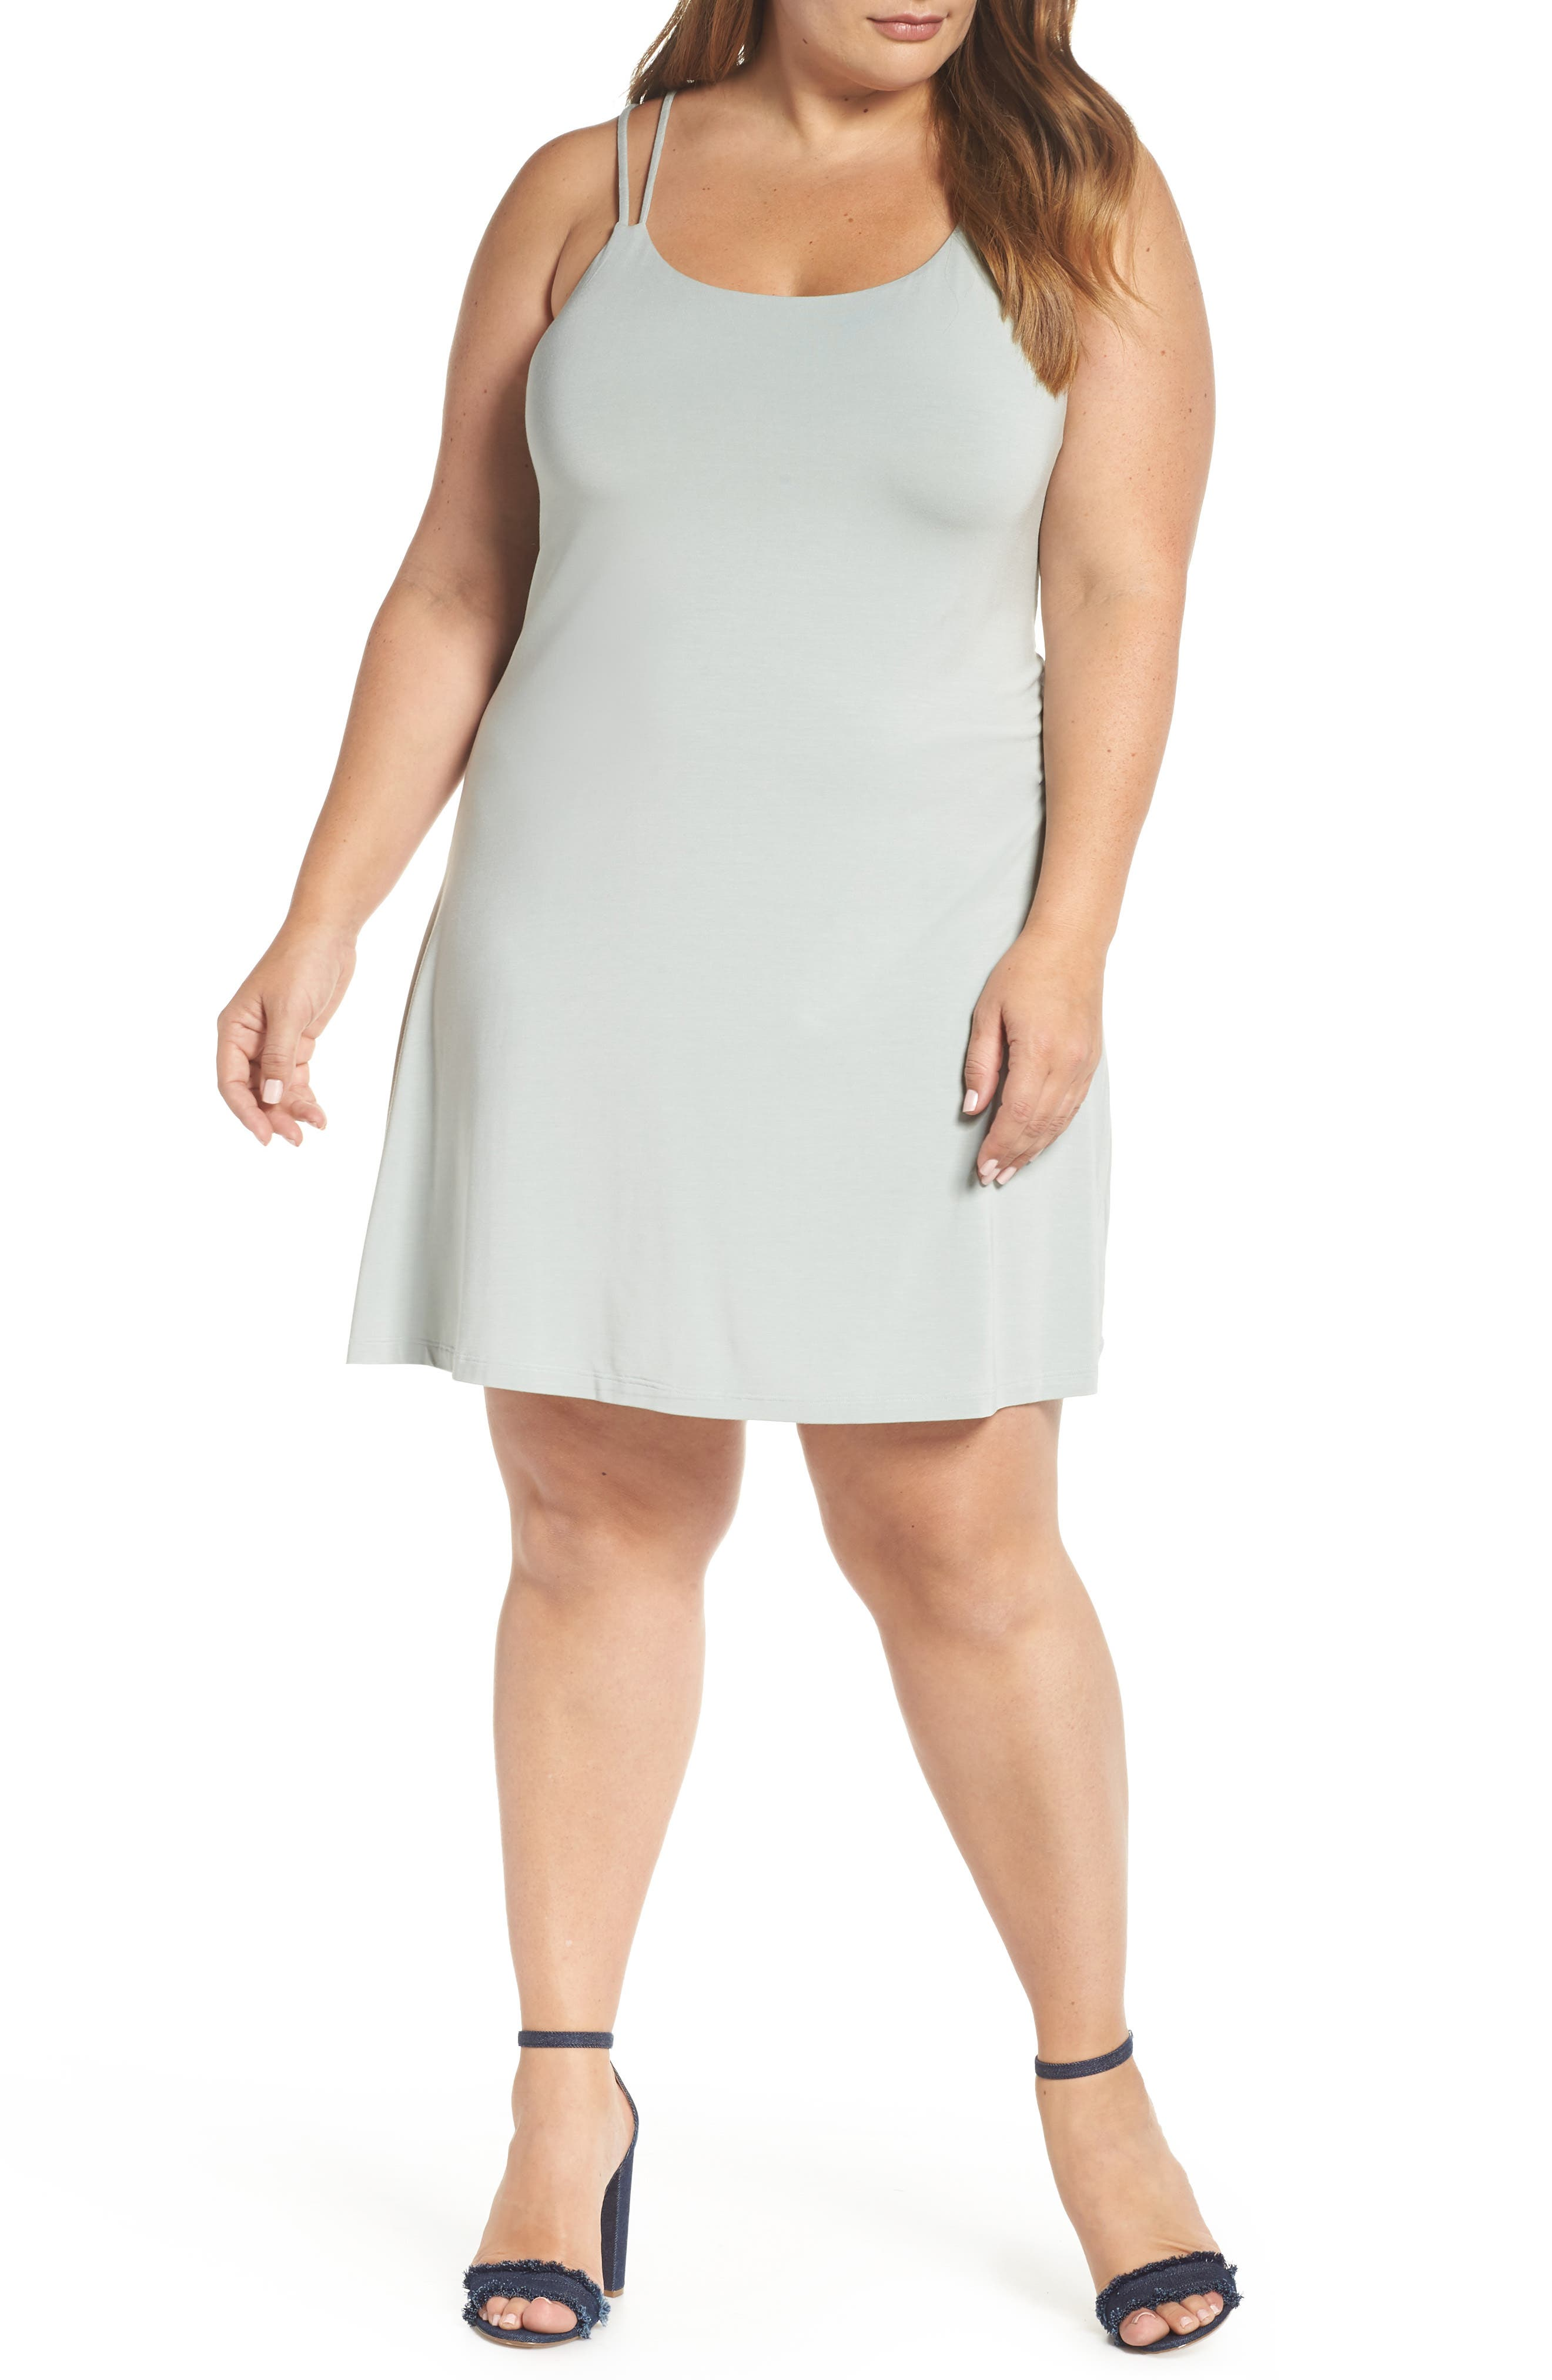 Plus Size Tart Harper Sleeveless Sheath Dress, Green